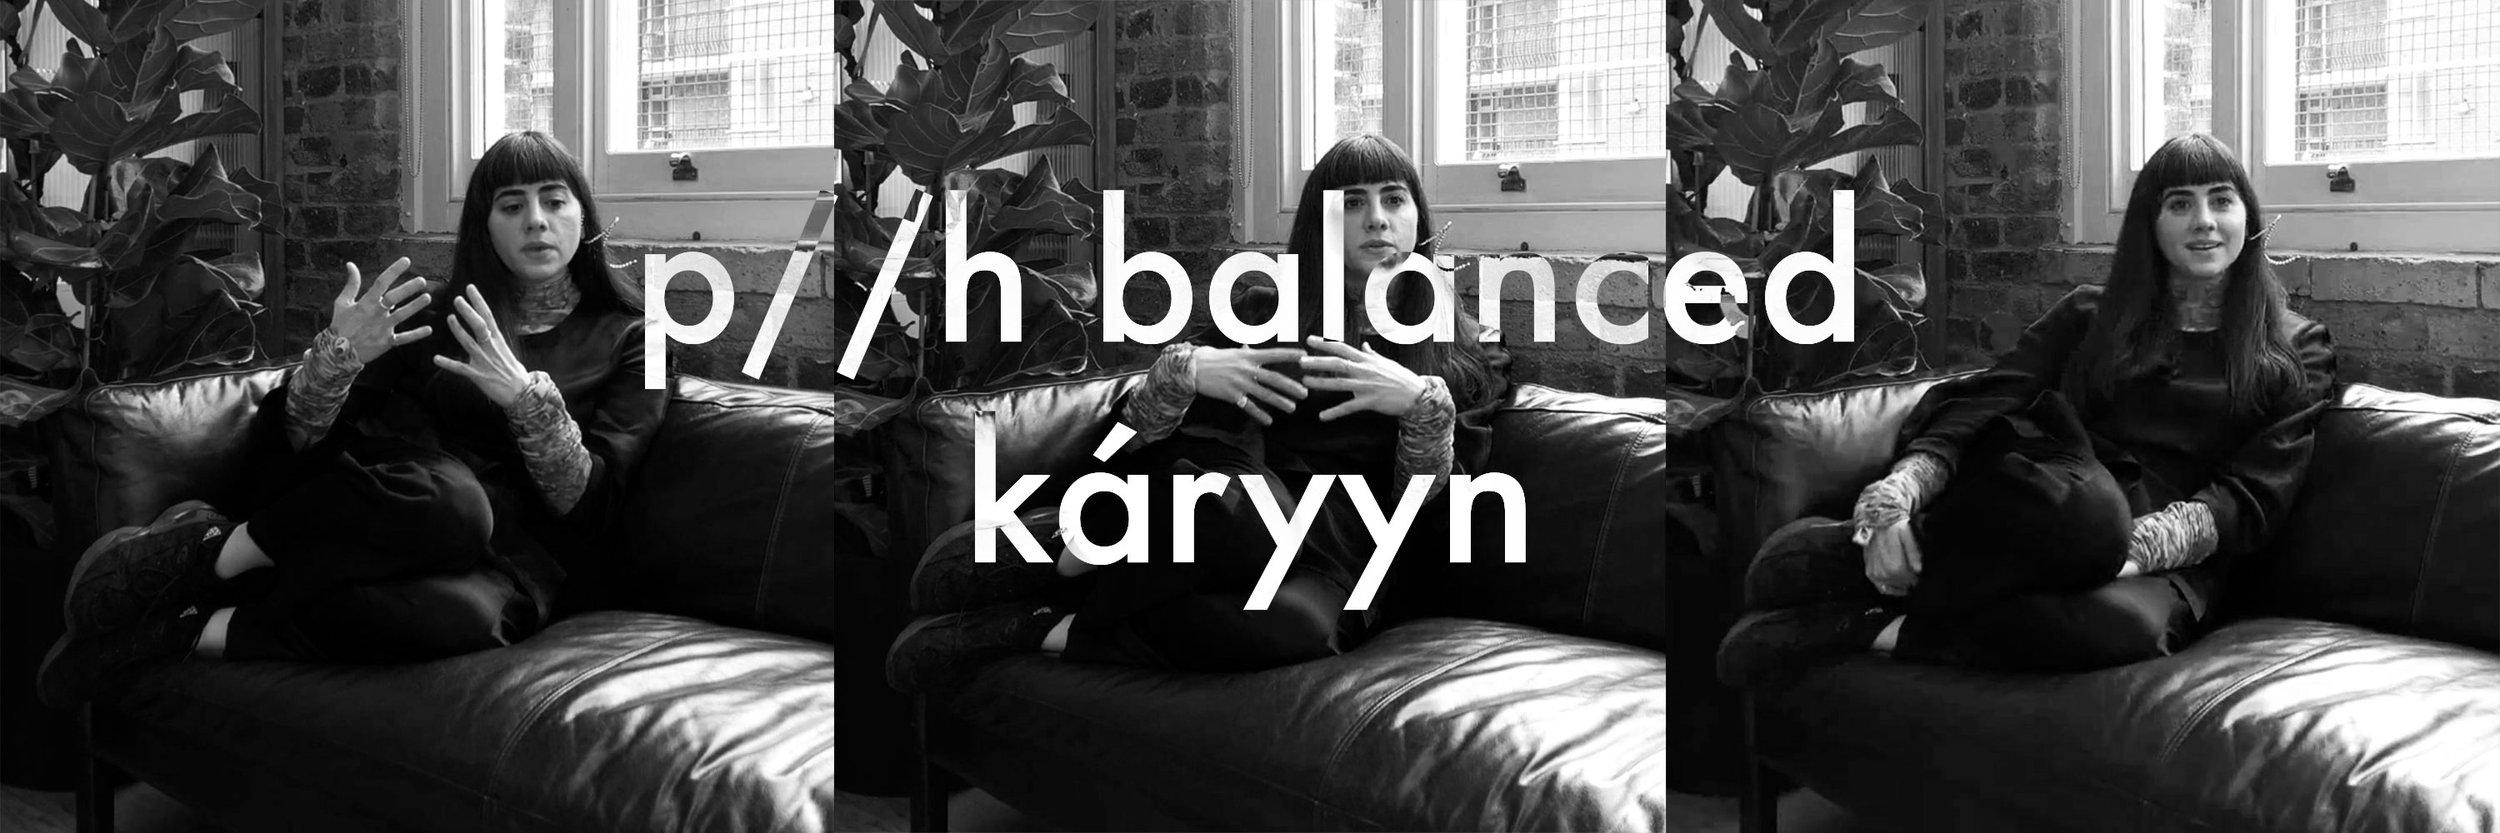 Karyyn-FRONT.jpg